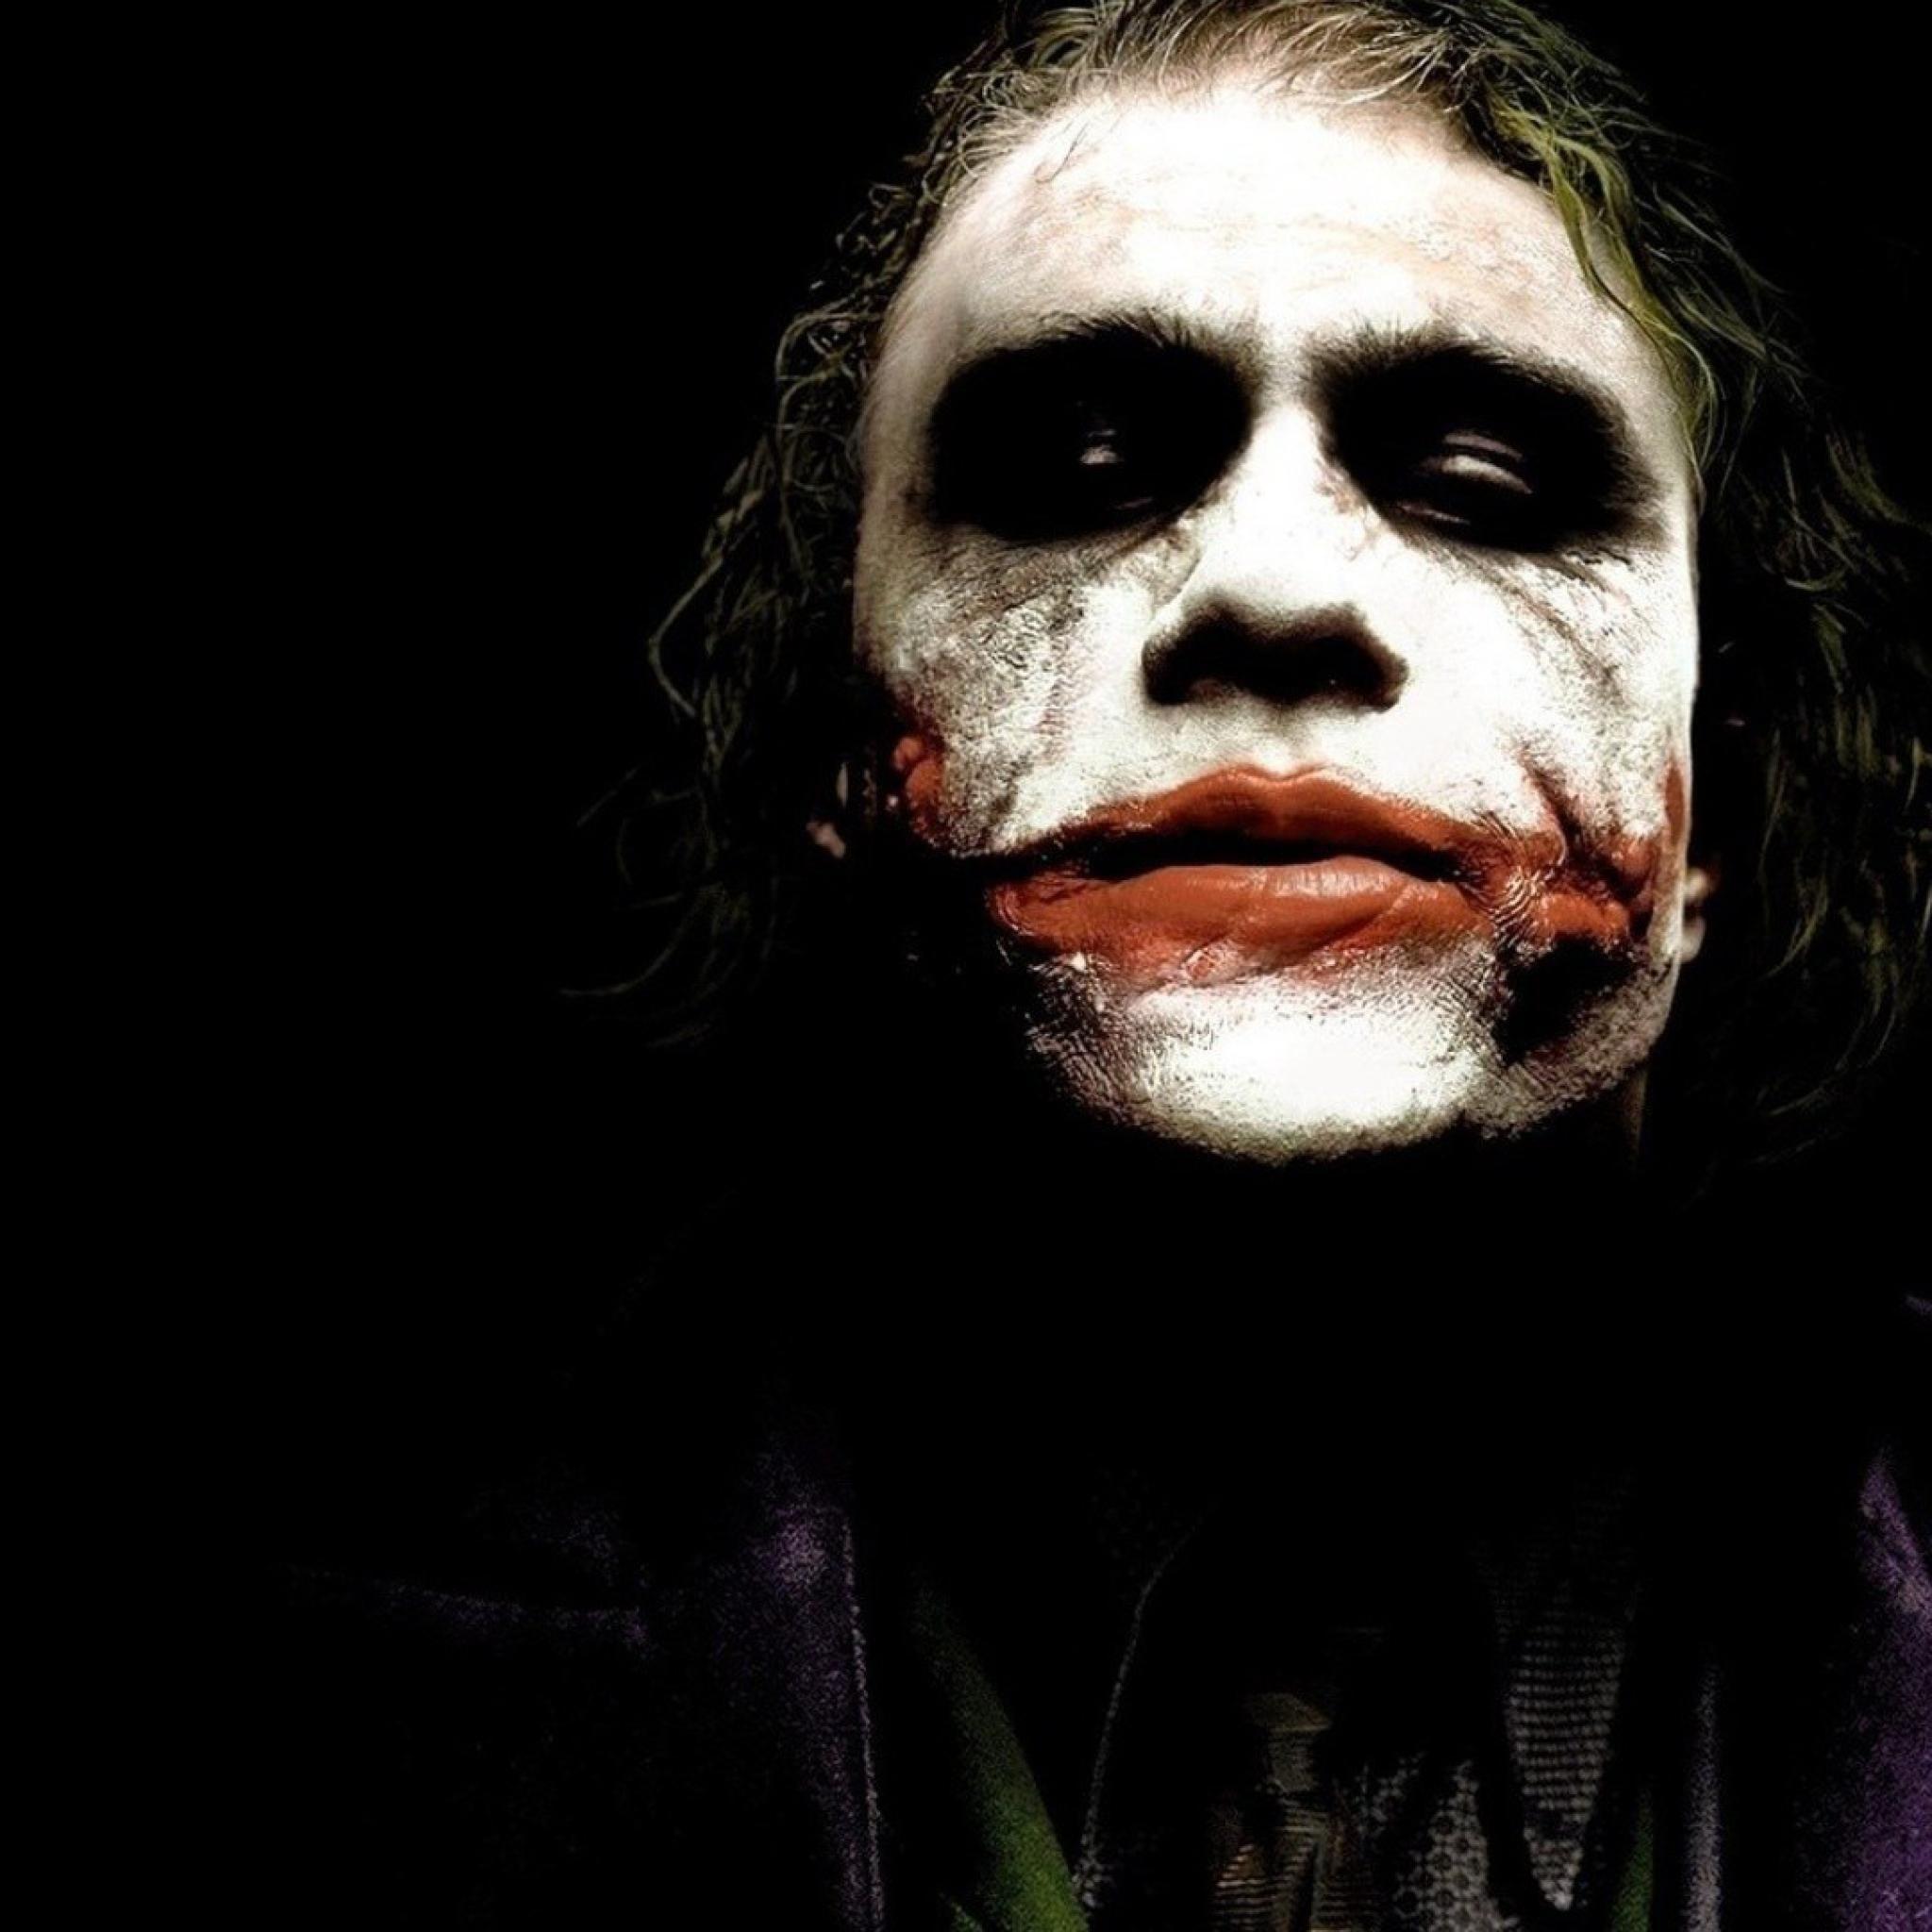 The Joker iPad Wallpaper HD #iPad #wallpaper | iPad Wallpapers